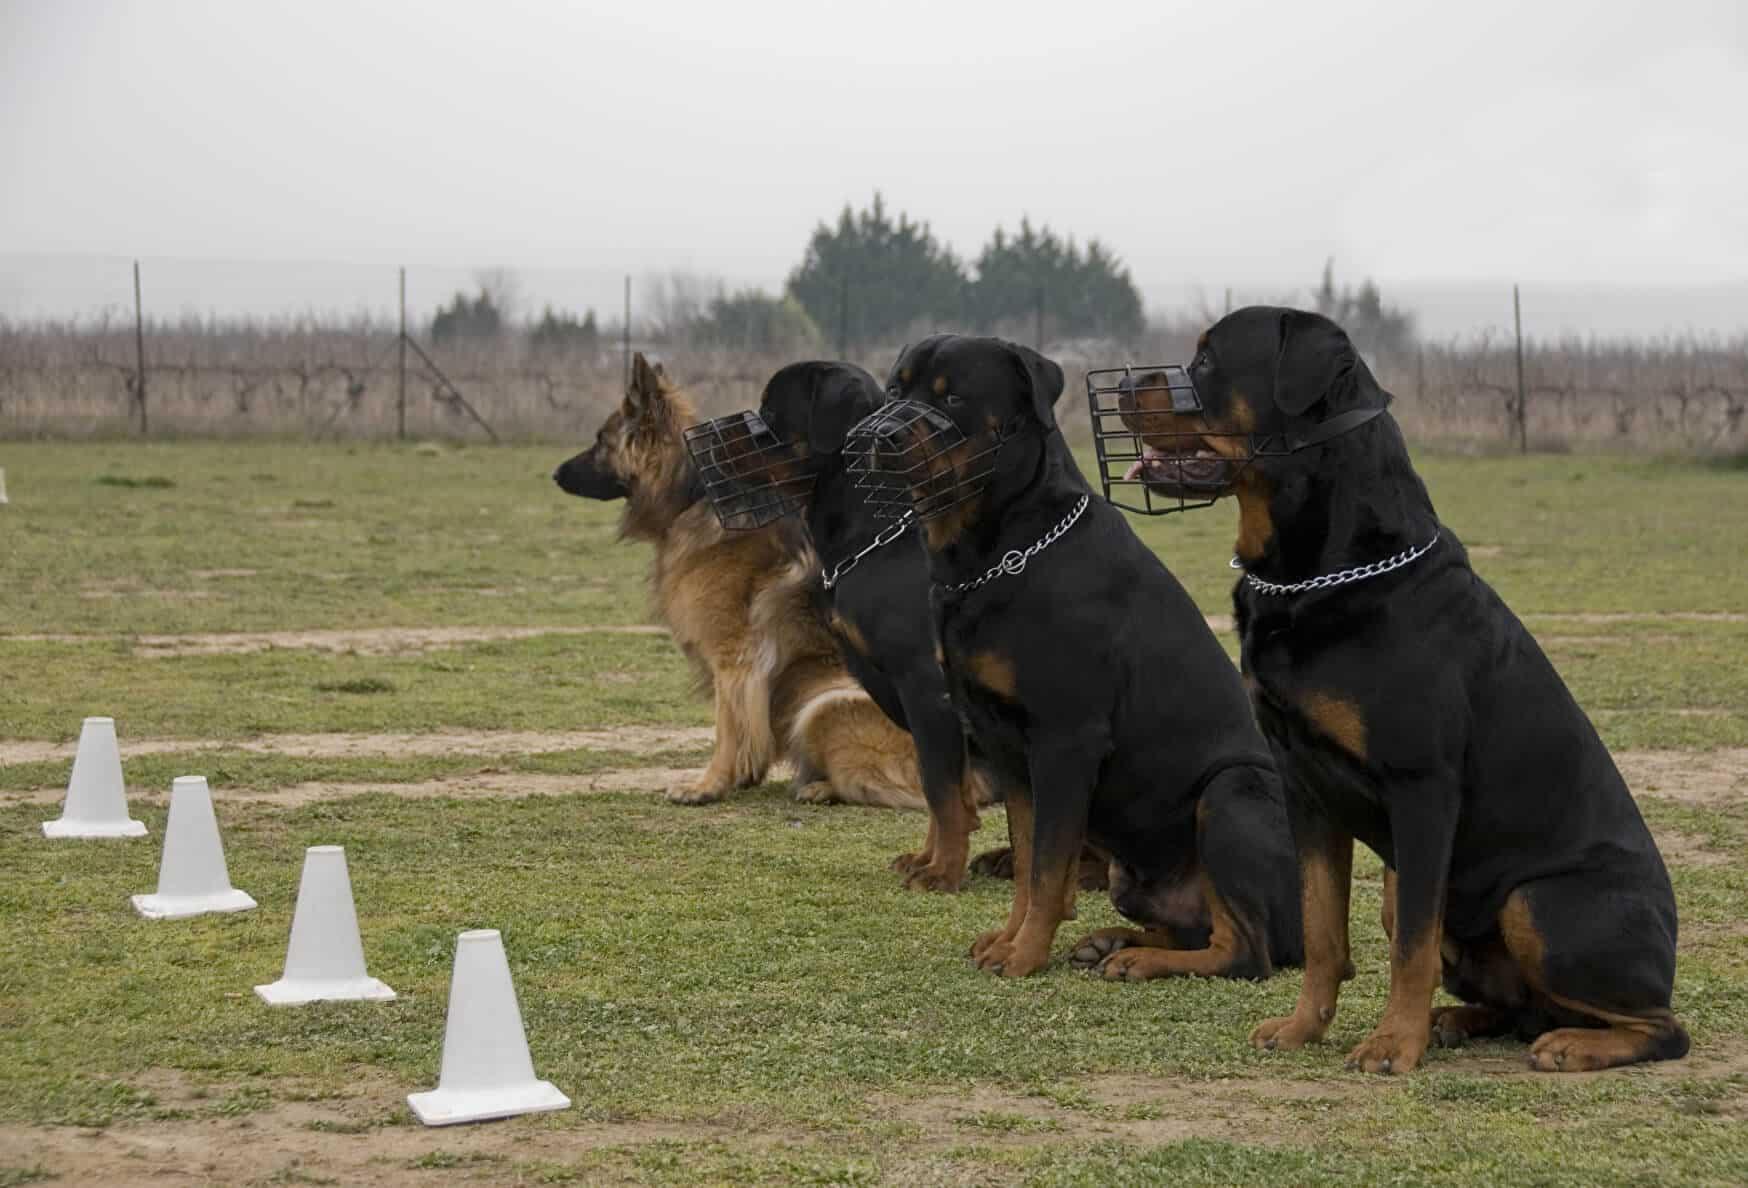 Listenhunde Kampfhunde 2020 Hundefuhrerschein De